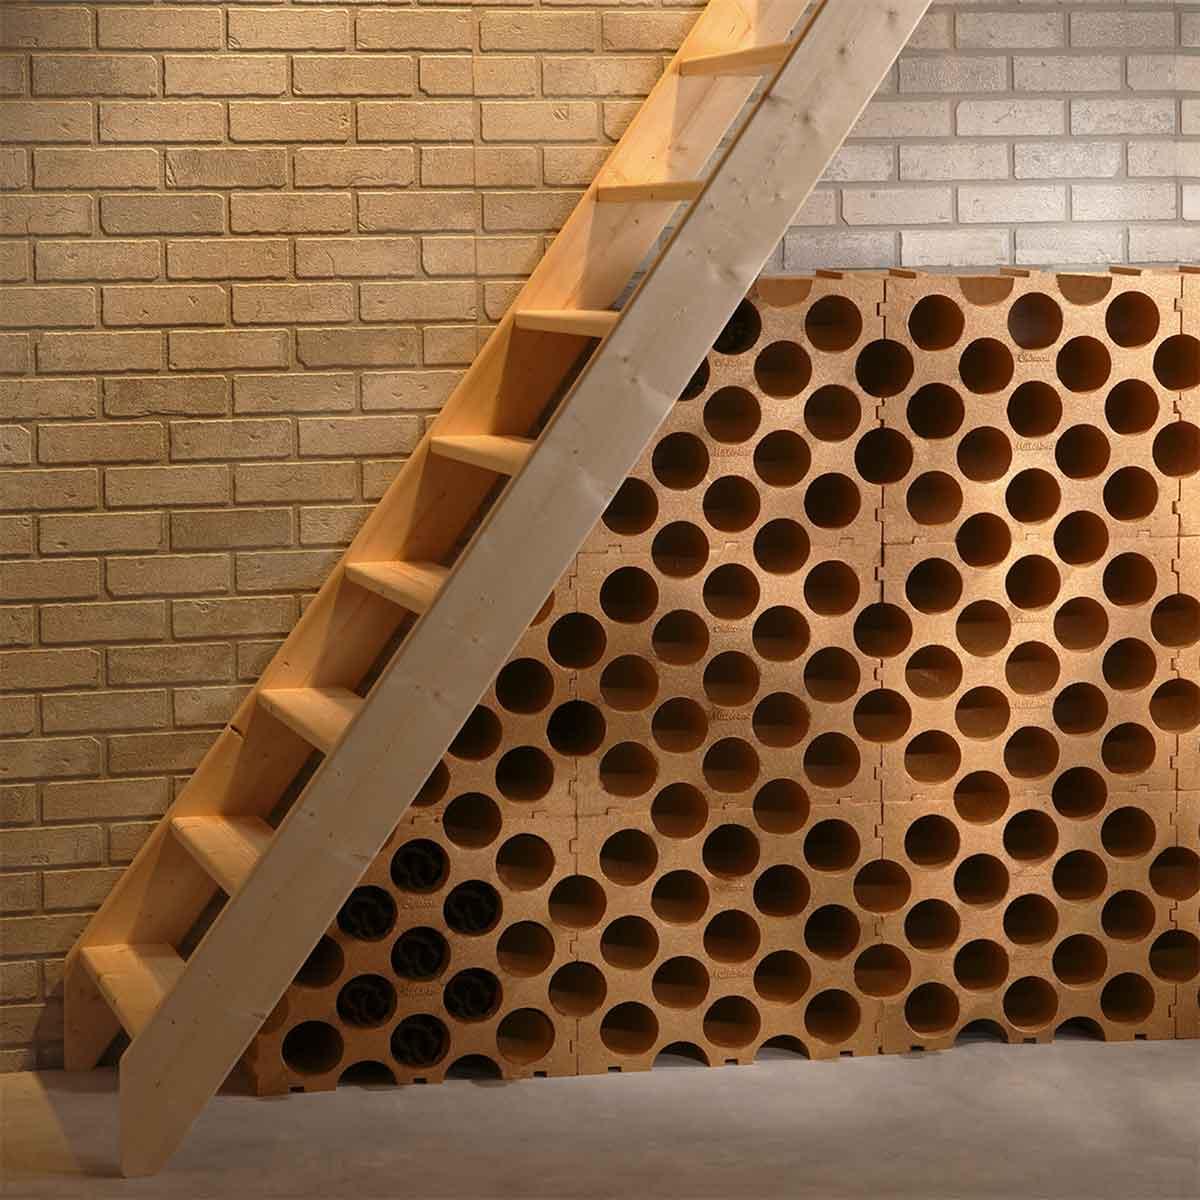 casier 15 bouteilles en polystyr ne couleur terre cuite cave. Black Bedroom Furniture Sets. Home Design Ideas